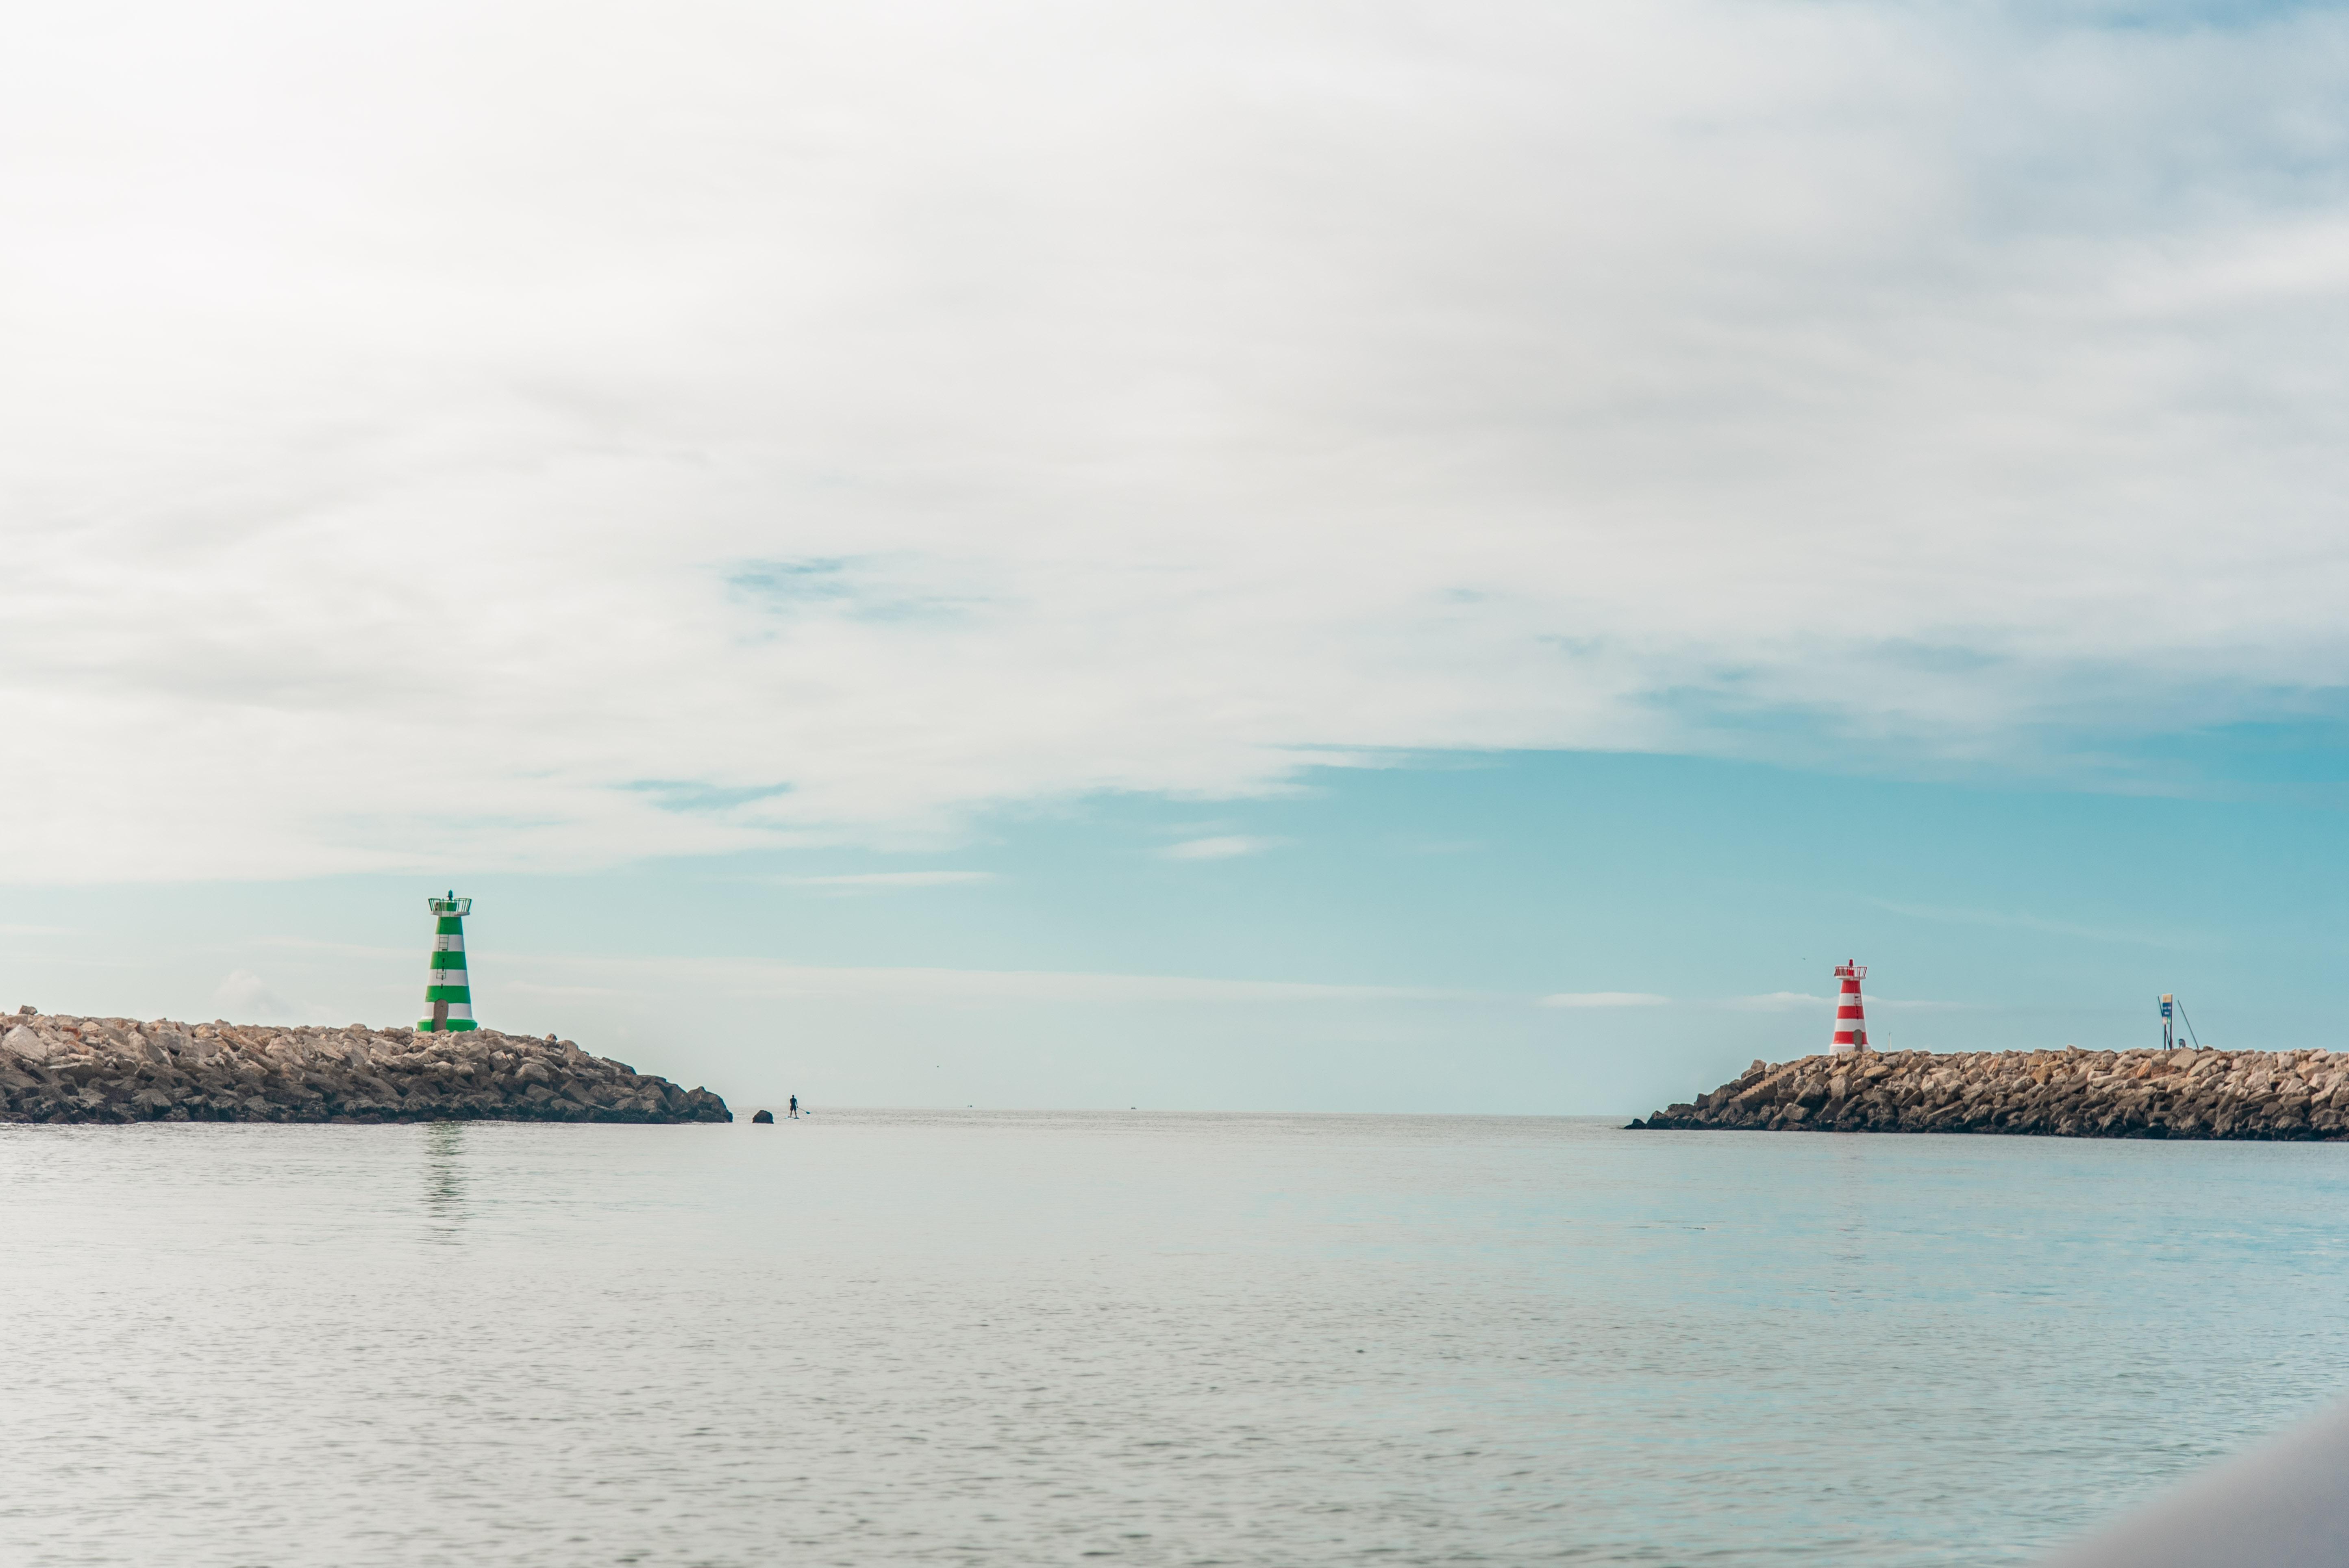 Quarteira, portugal photodiary, vilamoura, algarve, marina